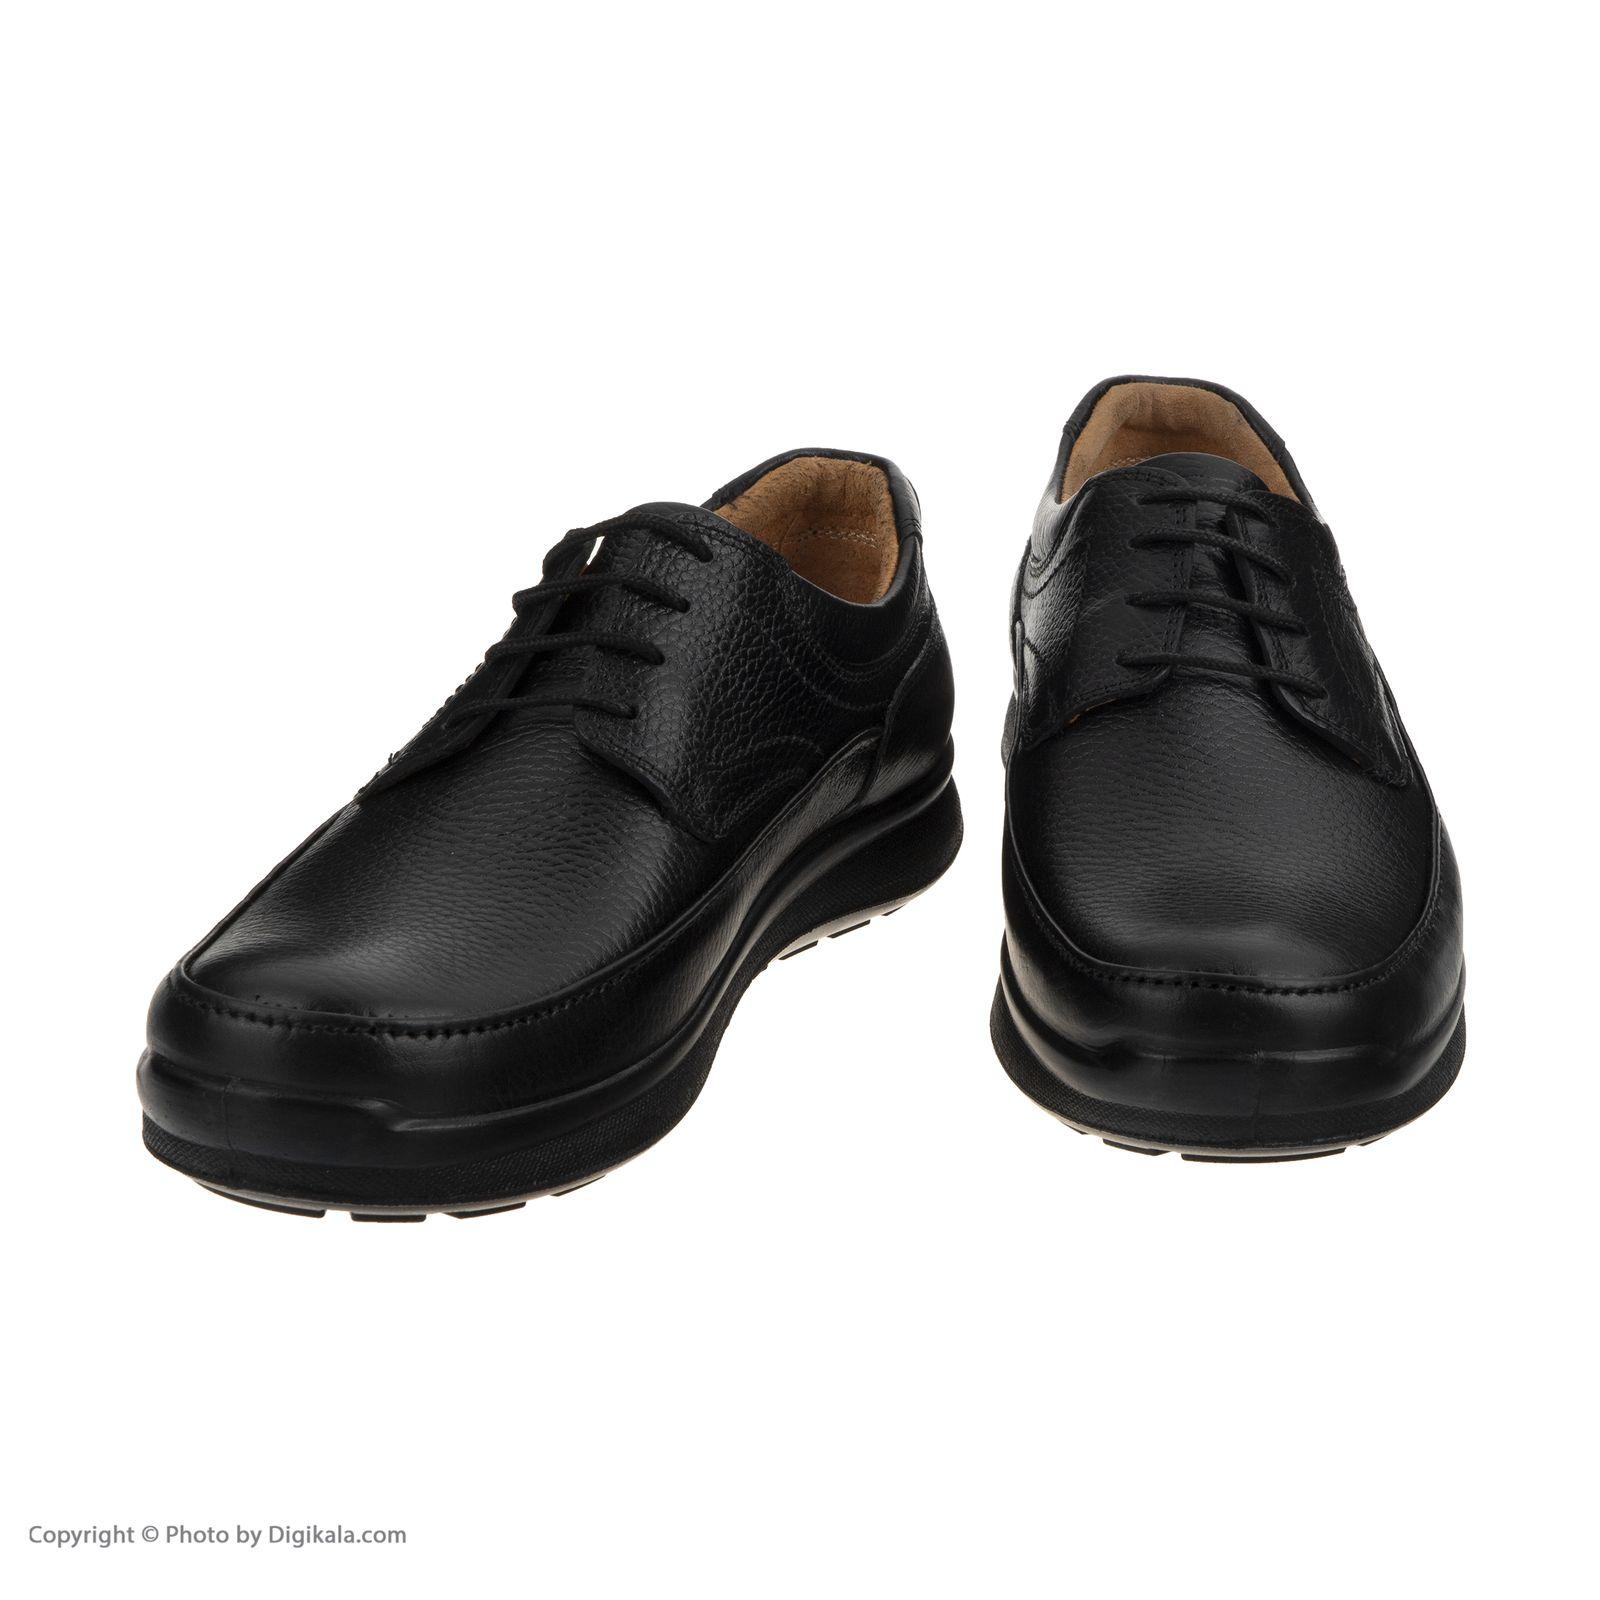 کفش روزمره مردانه بلوط مدل 7266C503101 -  - 6